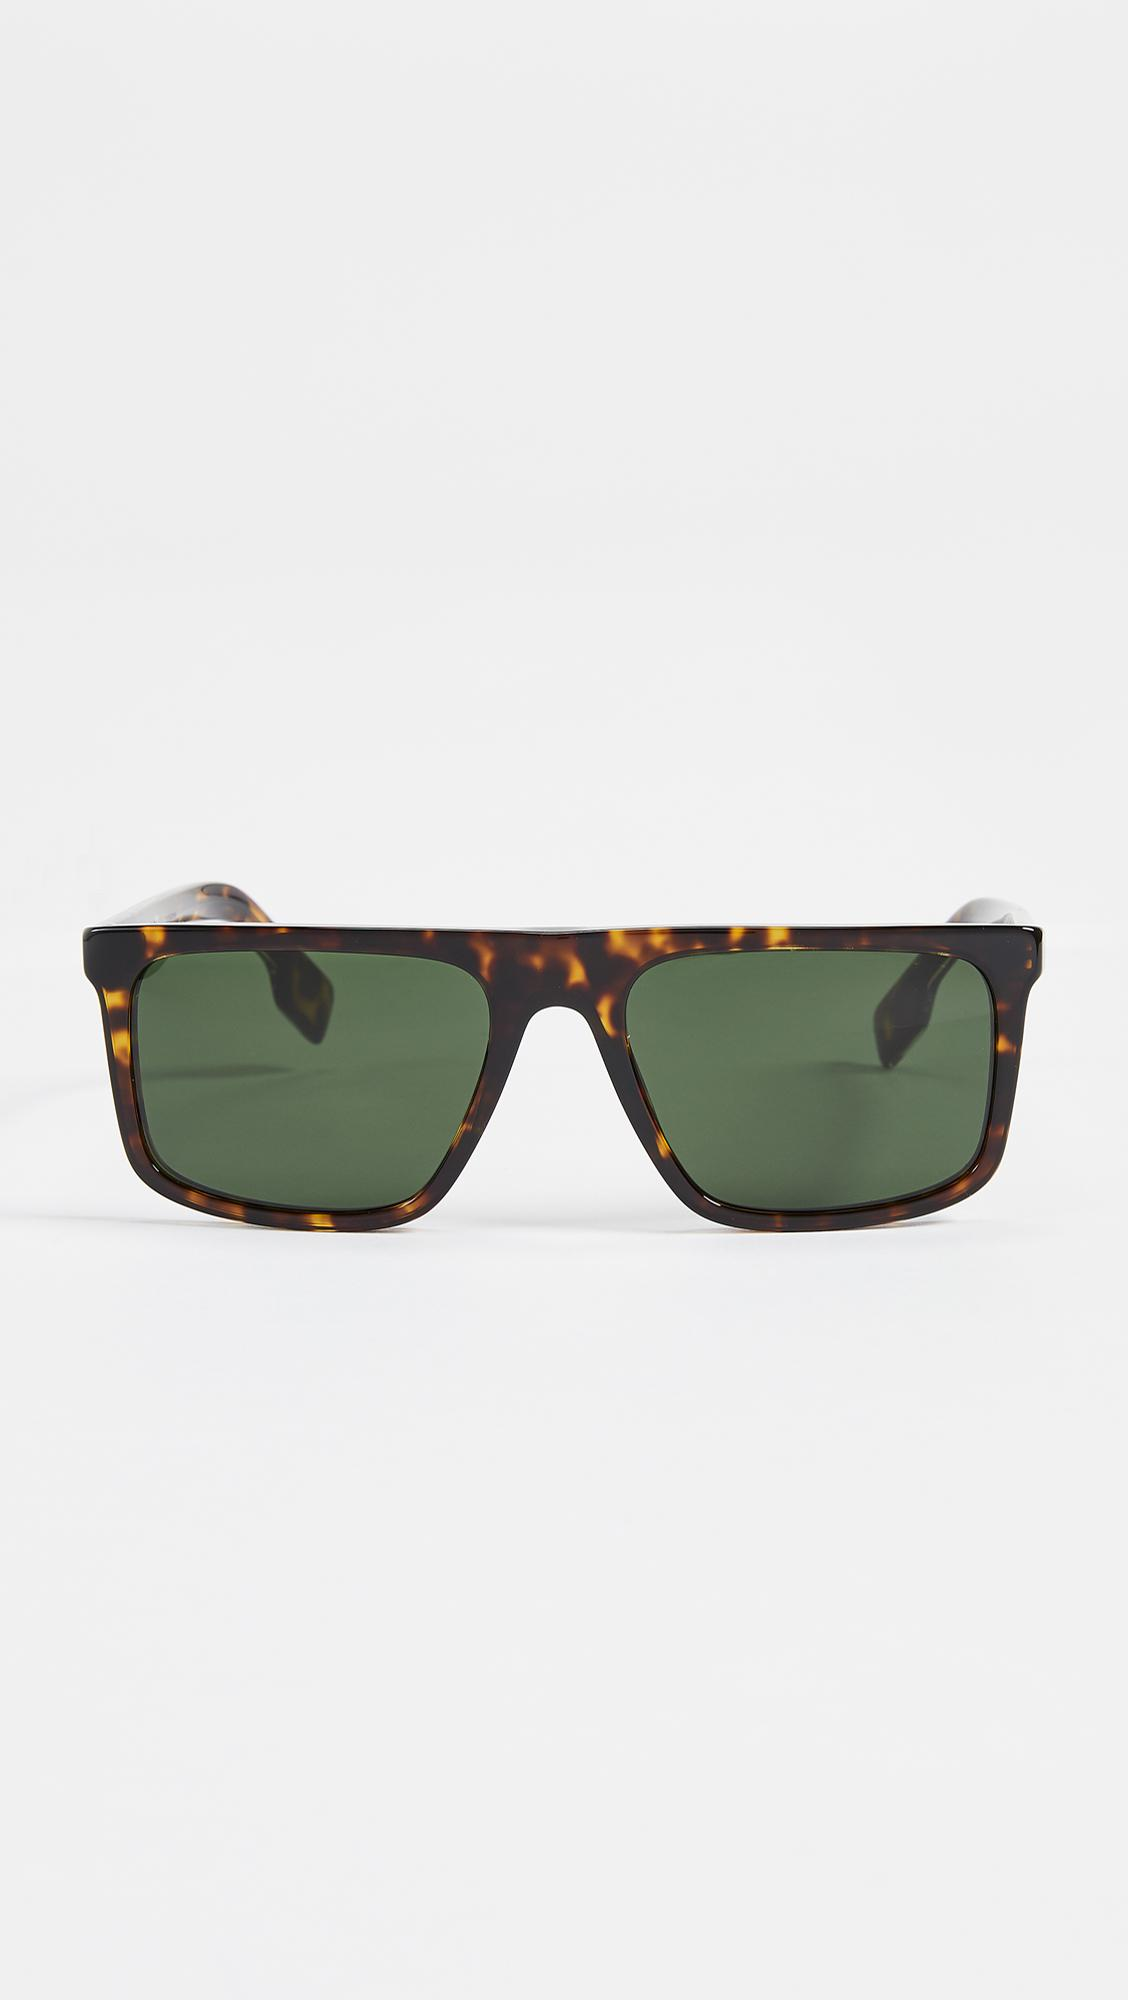 0080eda114f Burberry Flat Top Sunglasses in Green for Men - Lyst